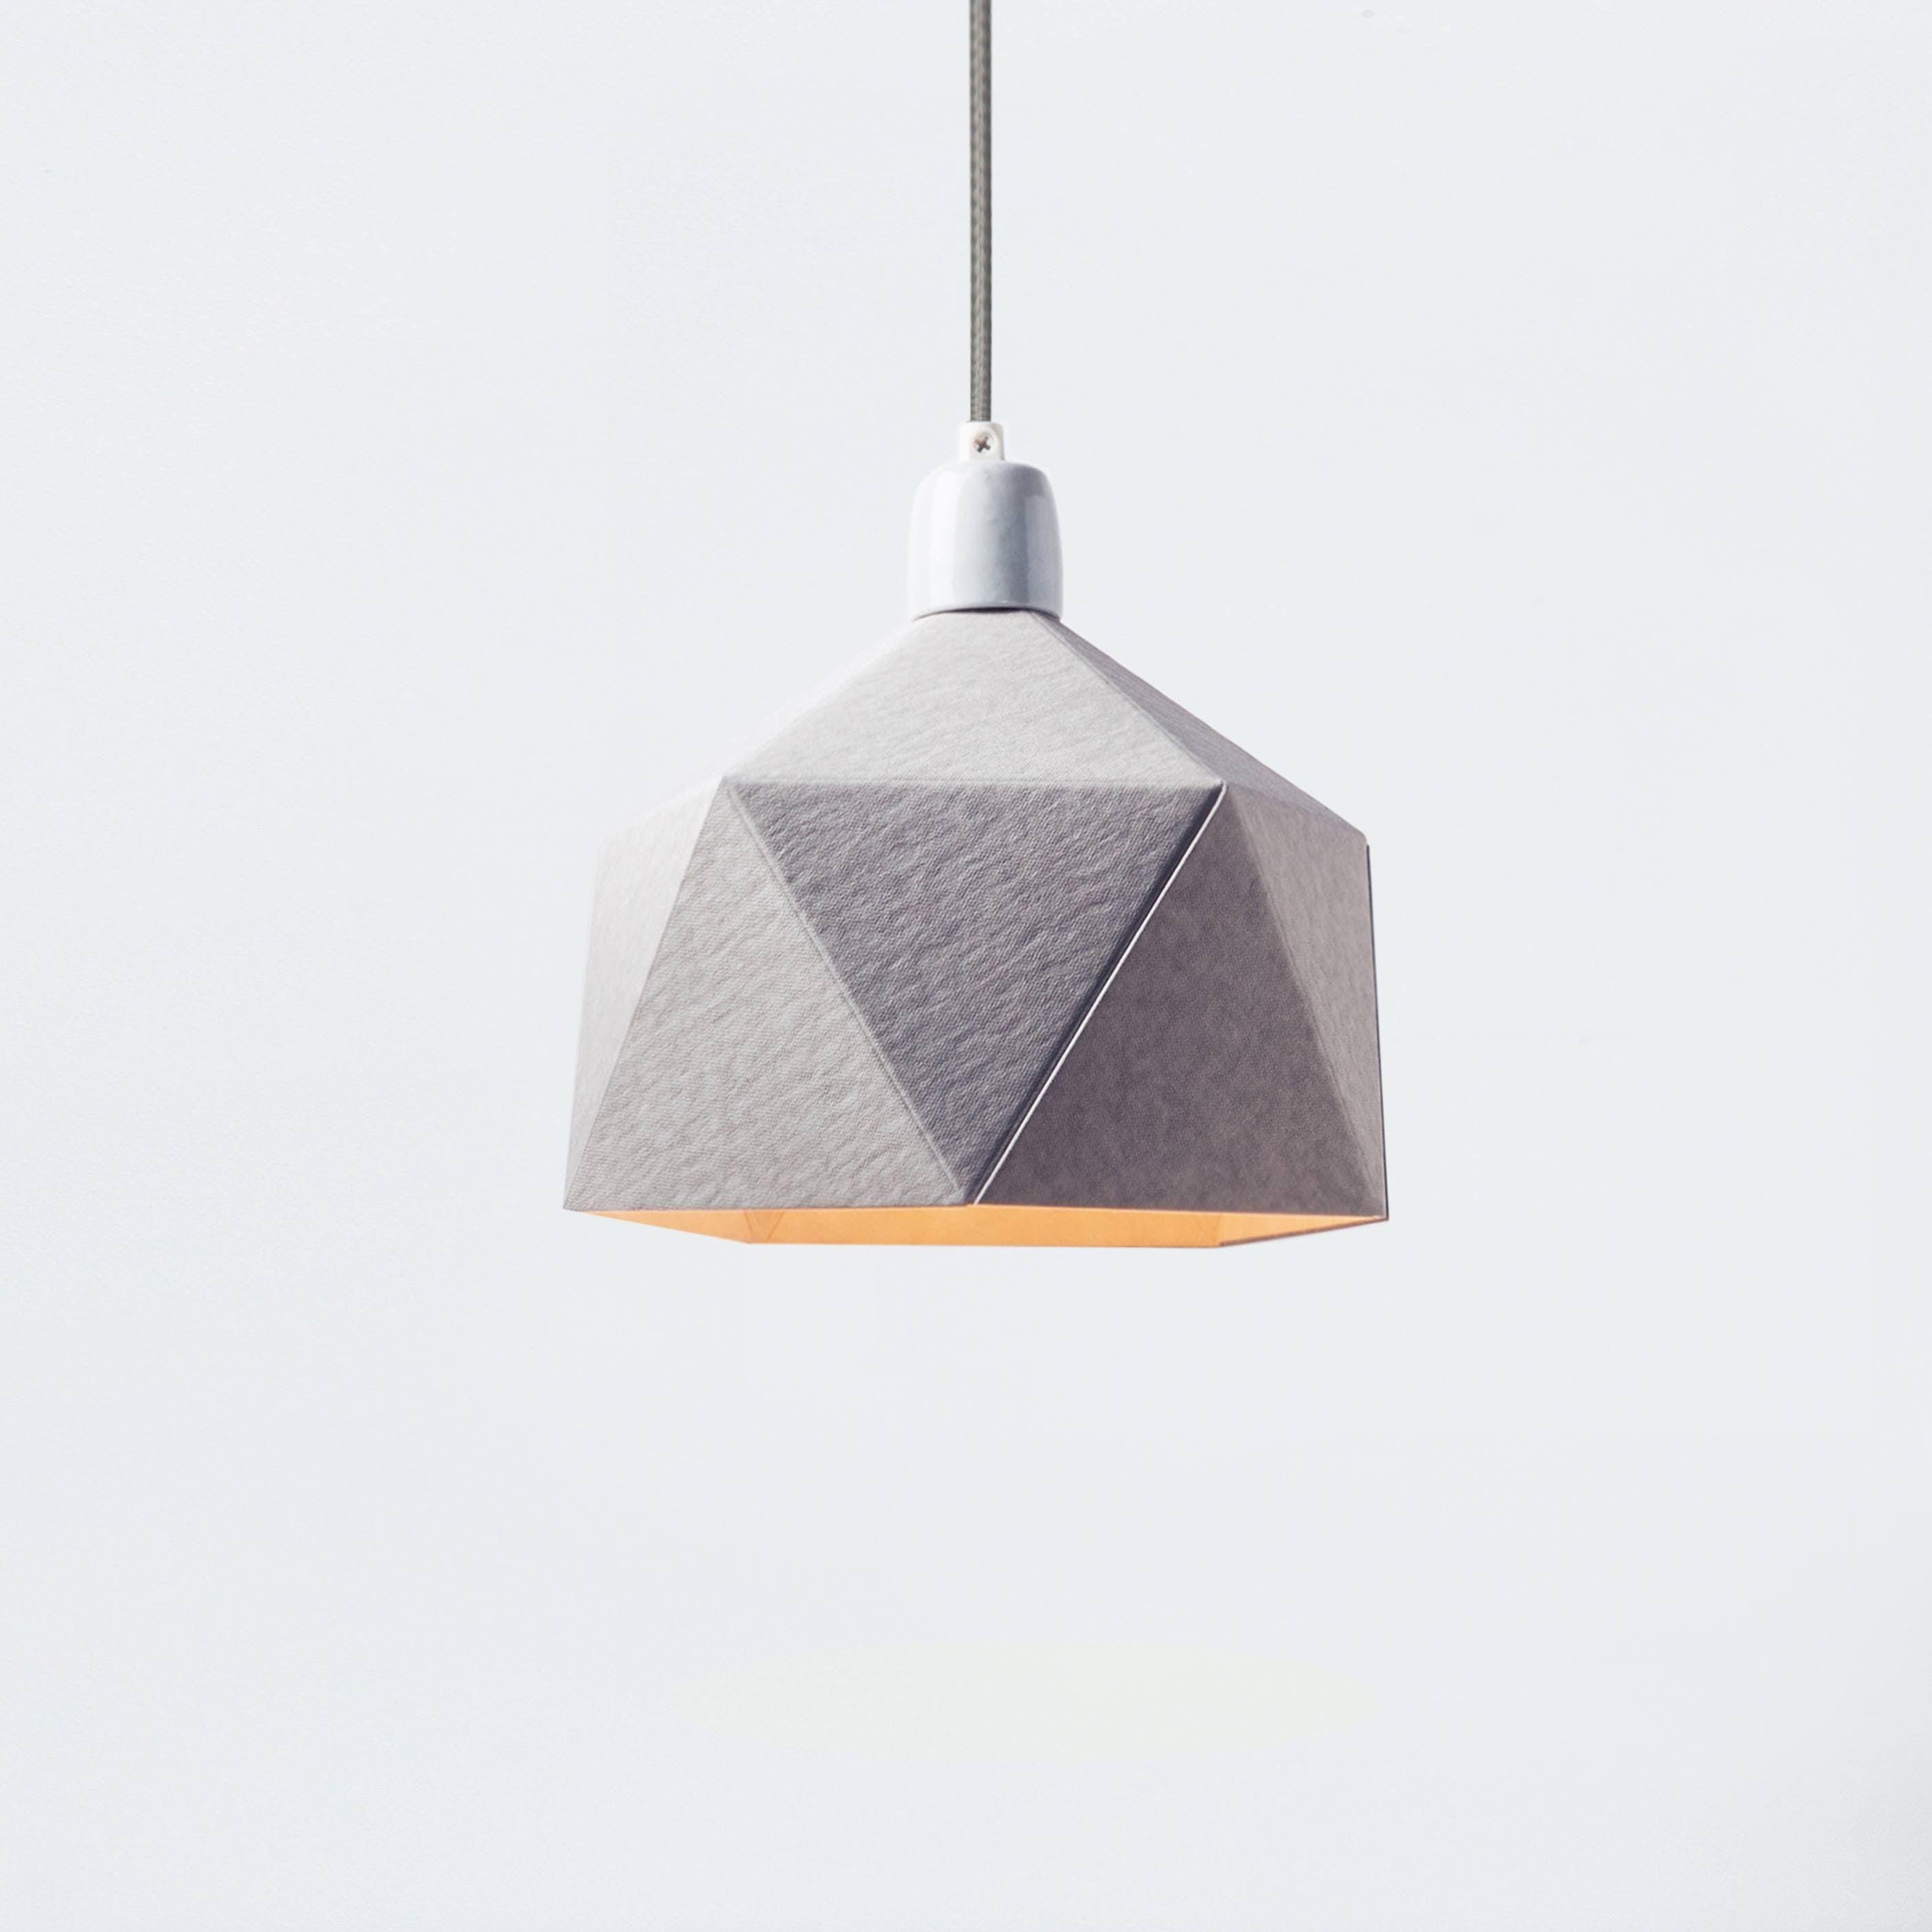 Shop Kami Geometric Ceiling Lamp Shade On Crowdyhouse Ikea Ceiling Light Ceiling Lamp Shades Geometric Ceiling Lamp